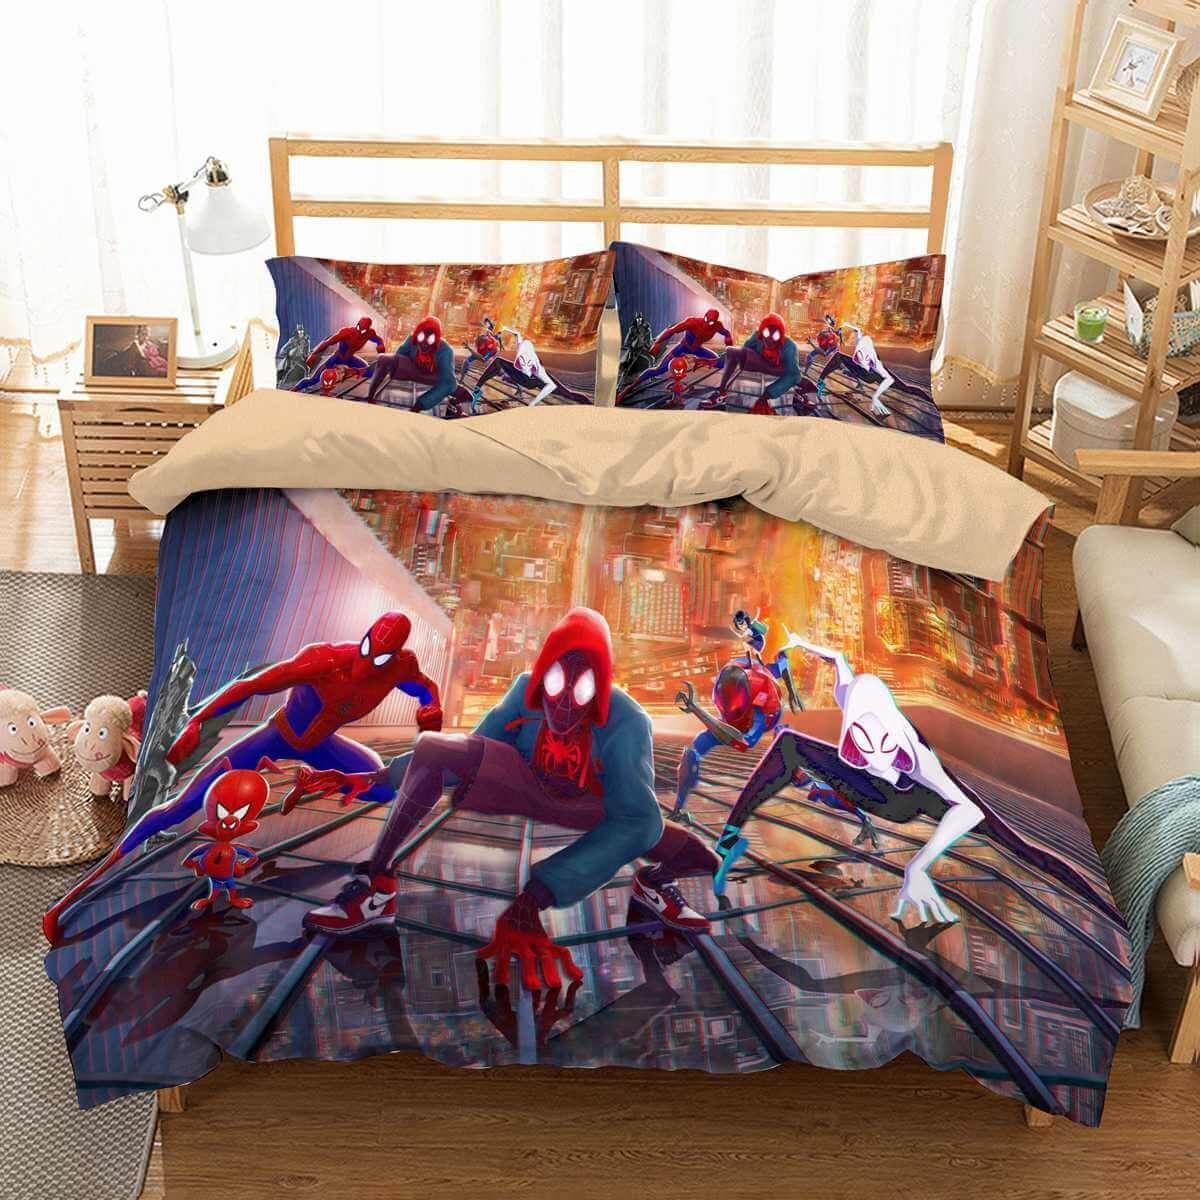 3d Customize Spider Man Into The Spider Verse Bedding Set Duvet